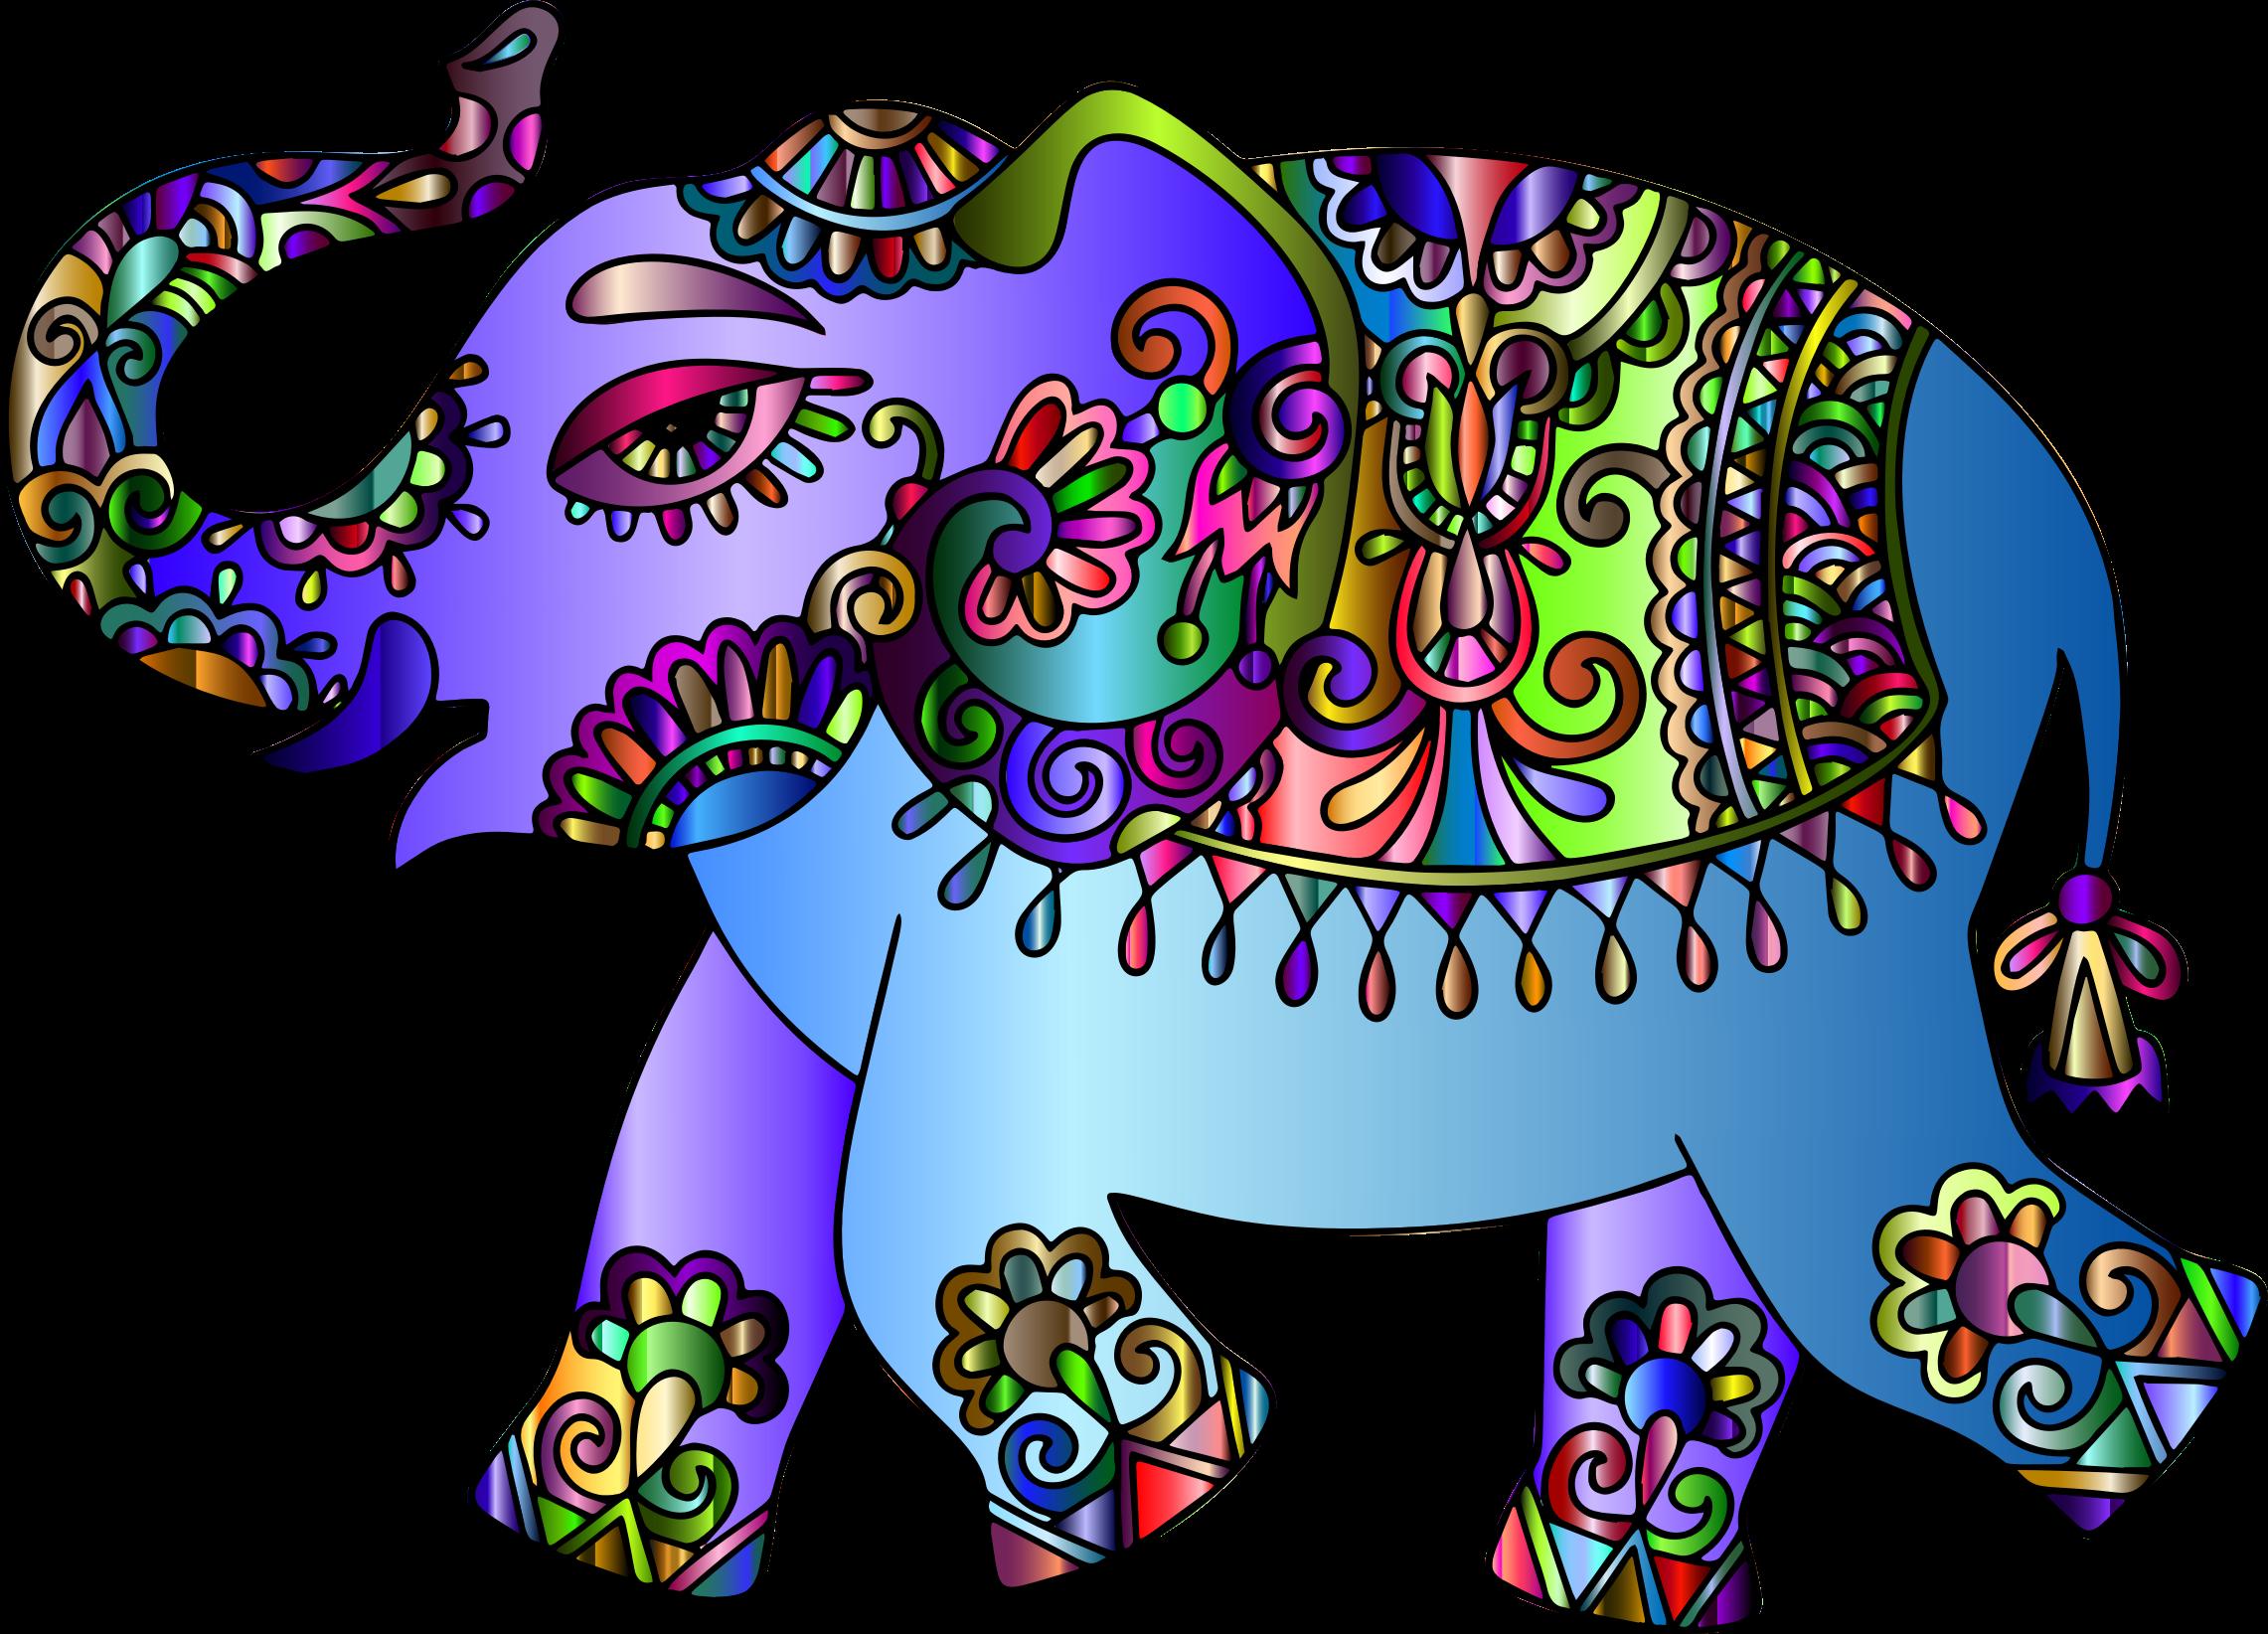 Prismatic playful big image. Clipart elephant floral